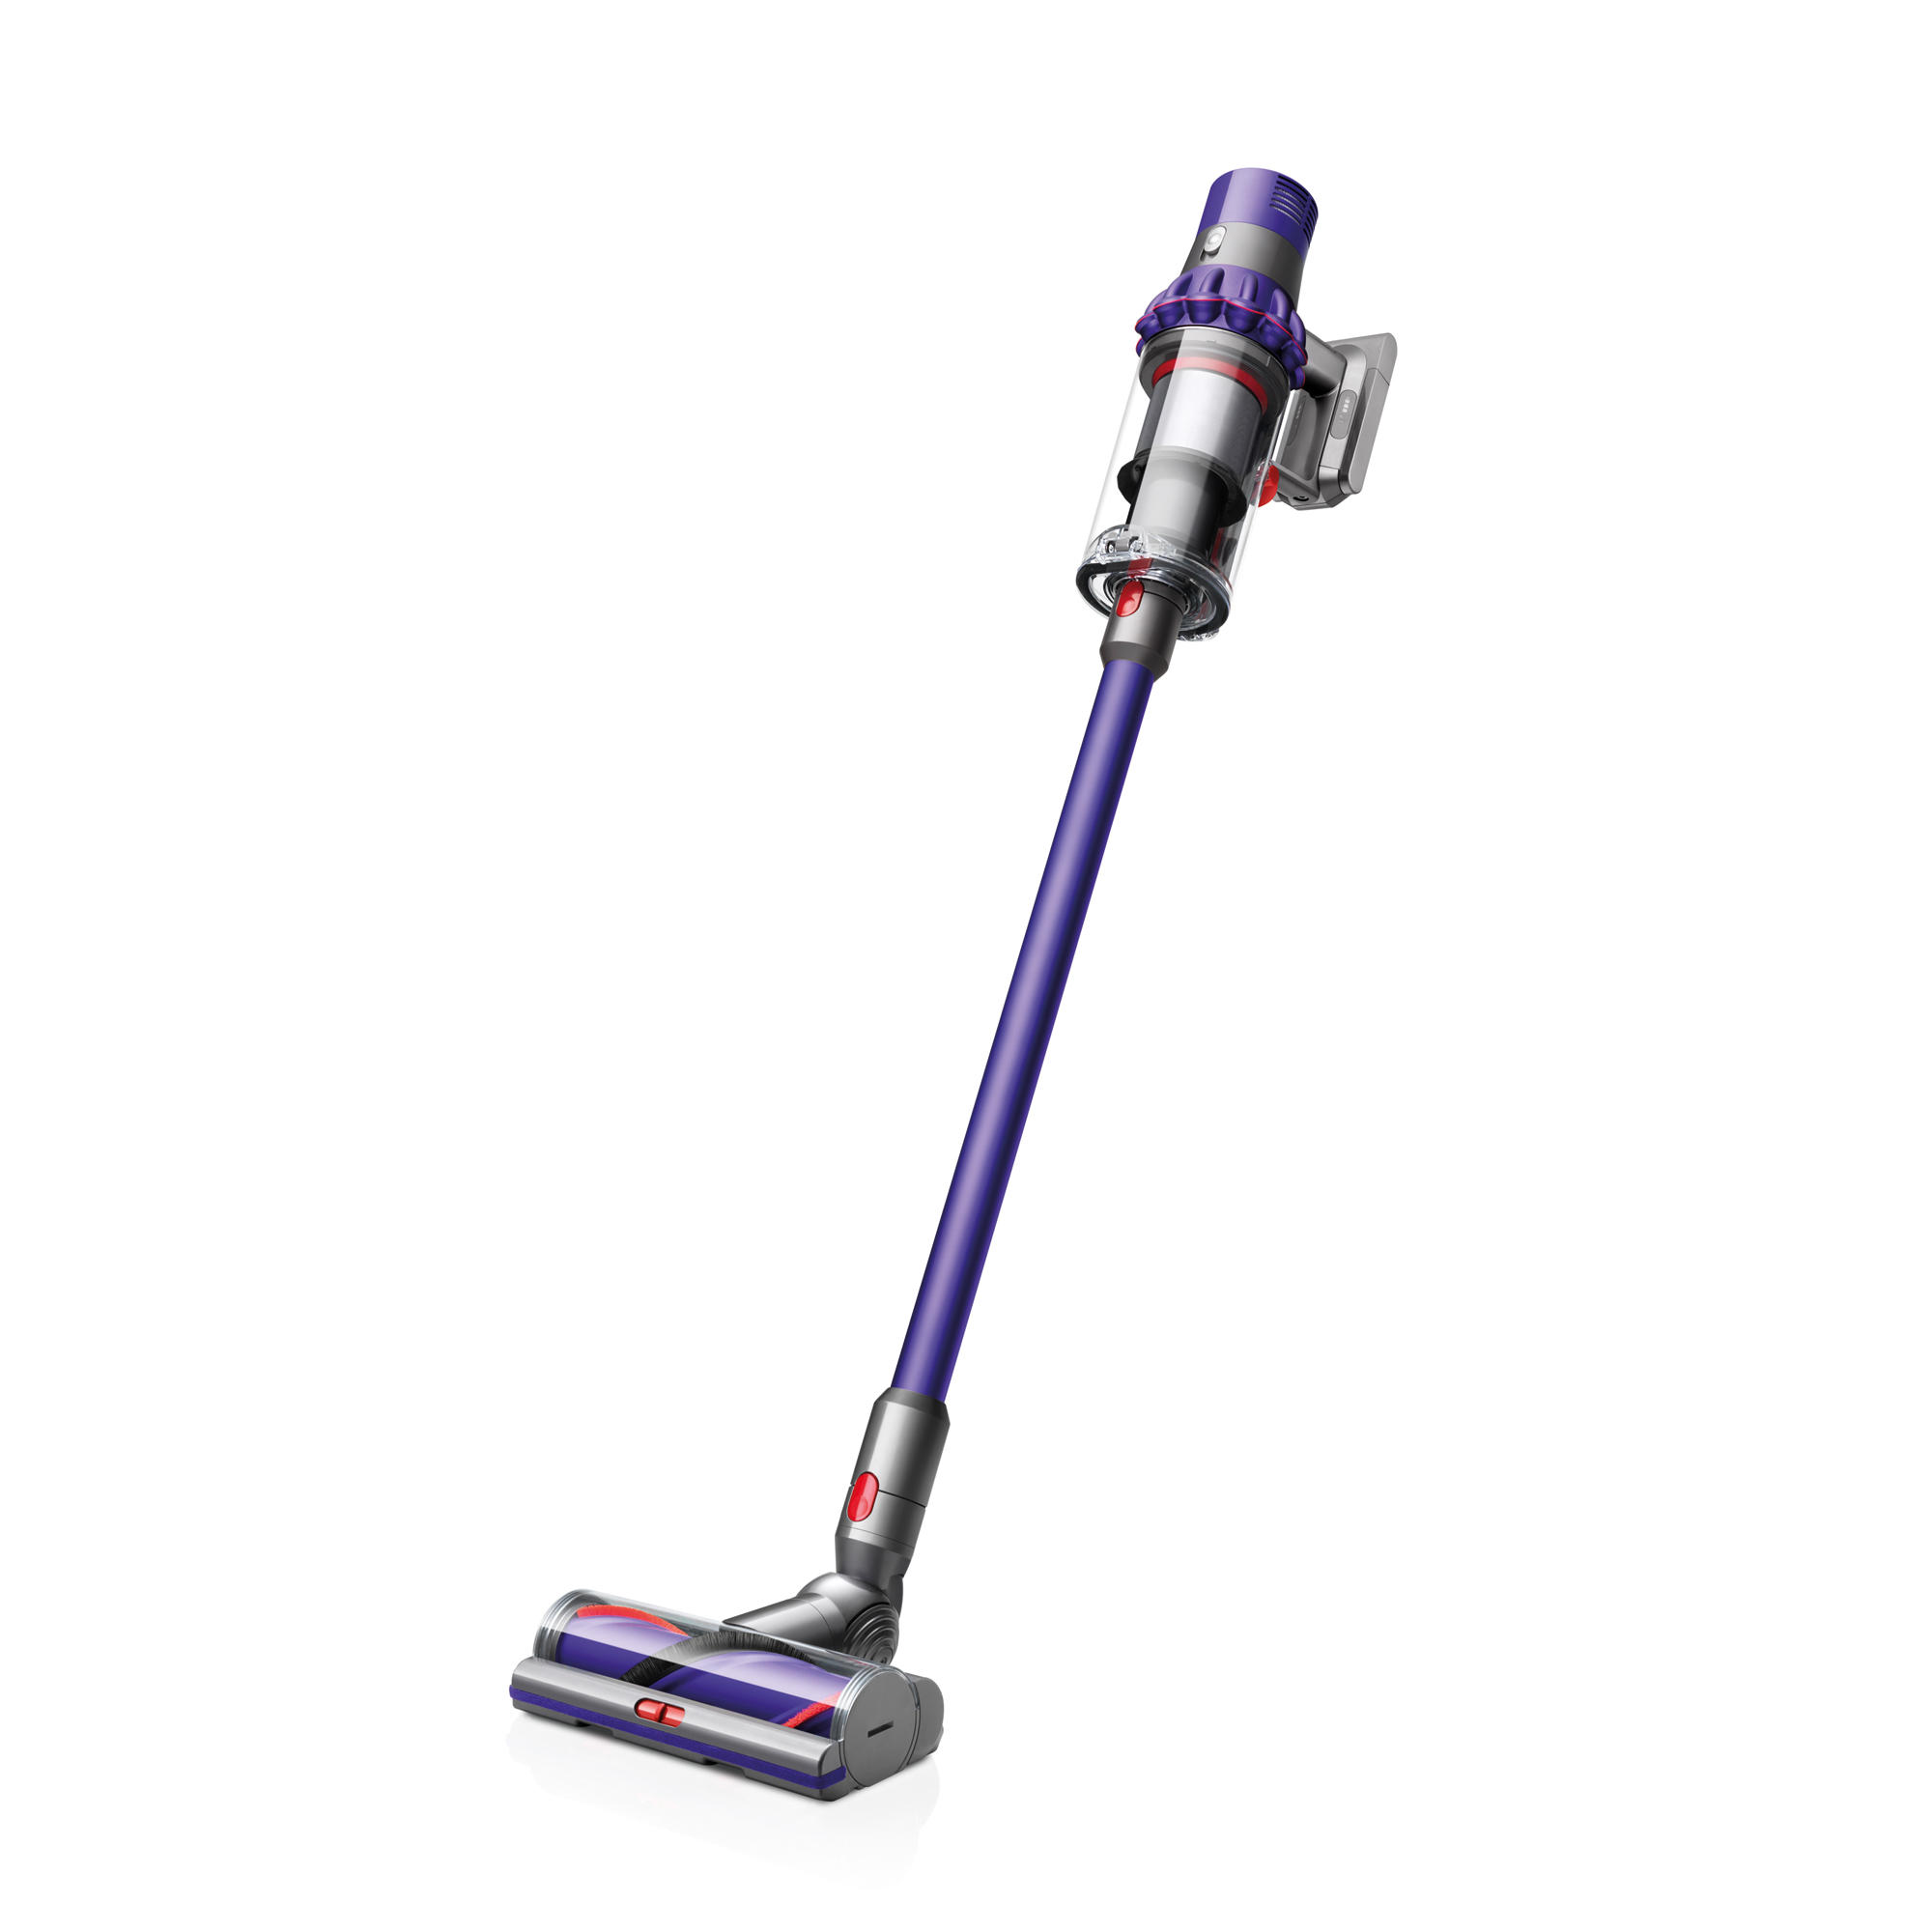 Dyson Cyclone V10 Animal Cordless Vacuum Iron/Purple